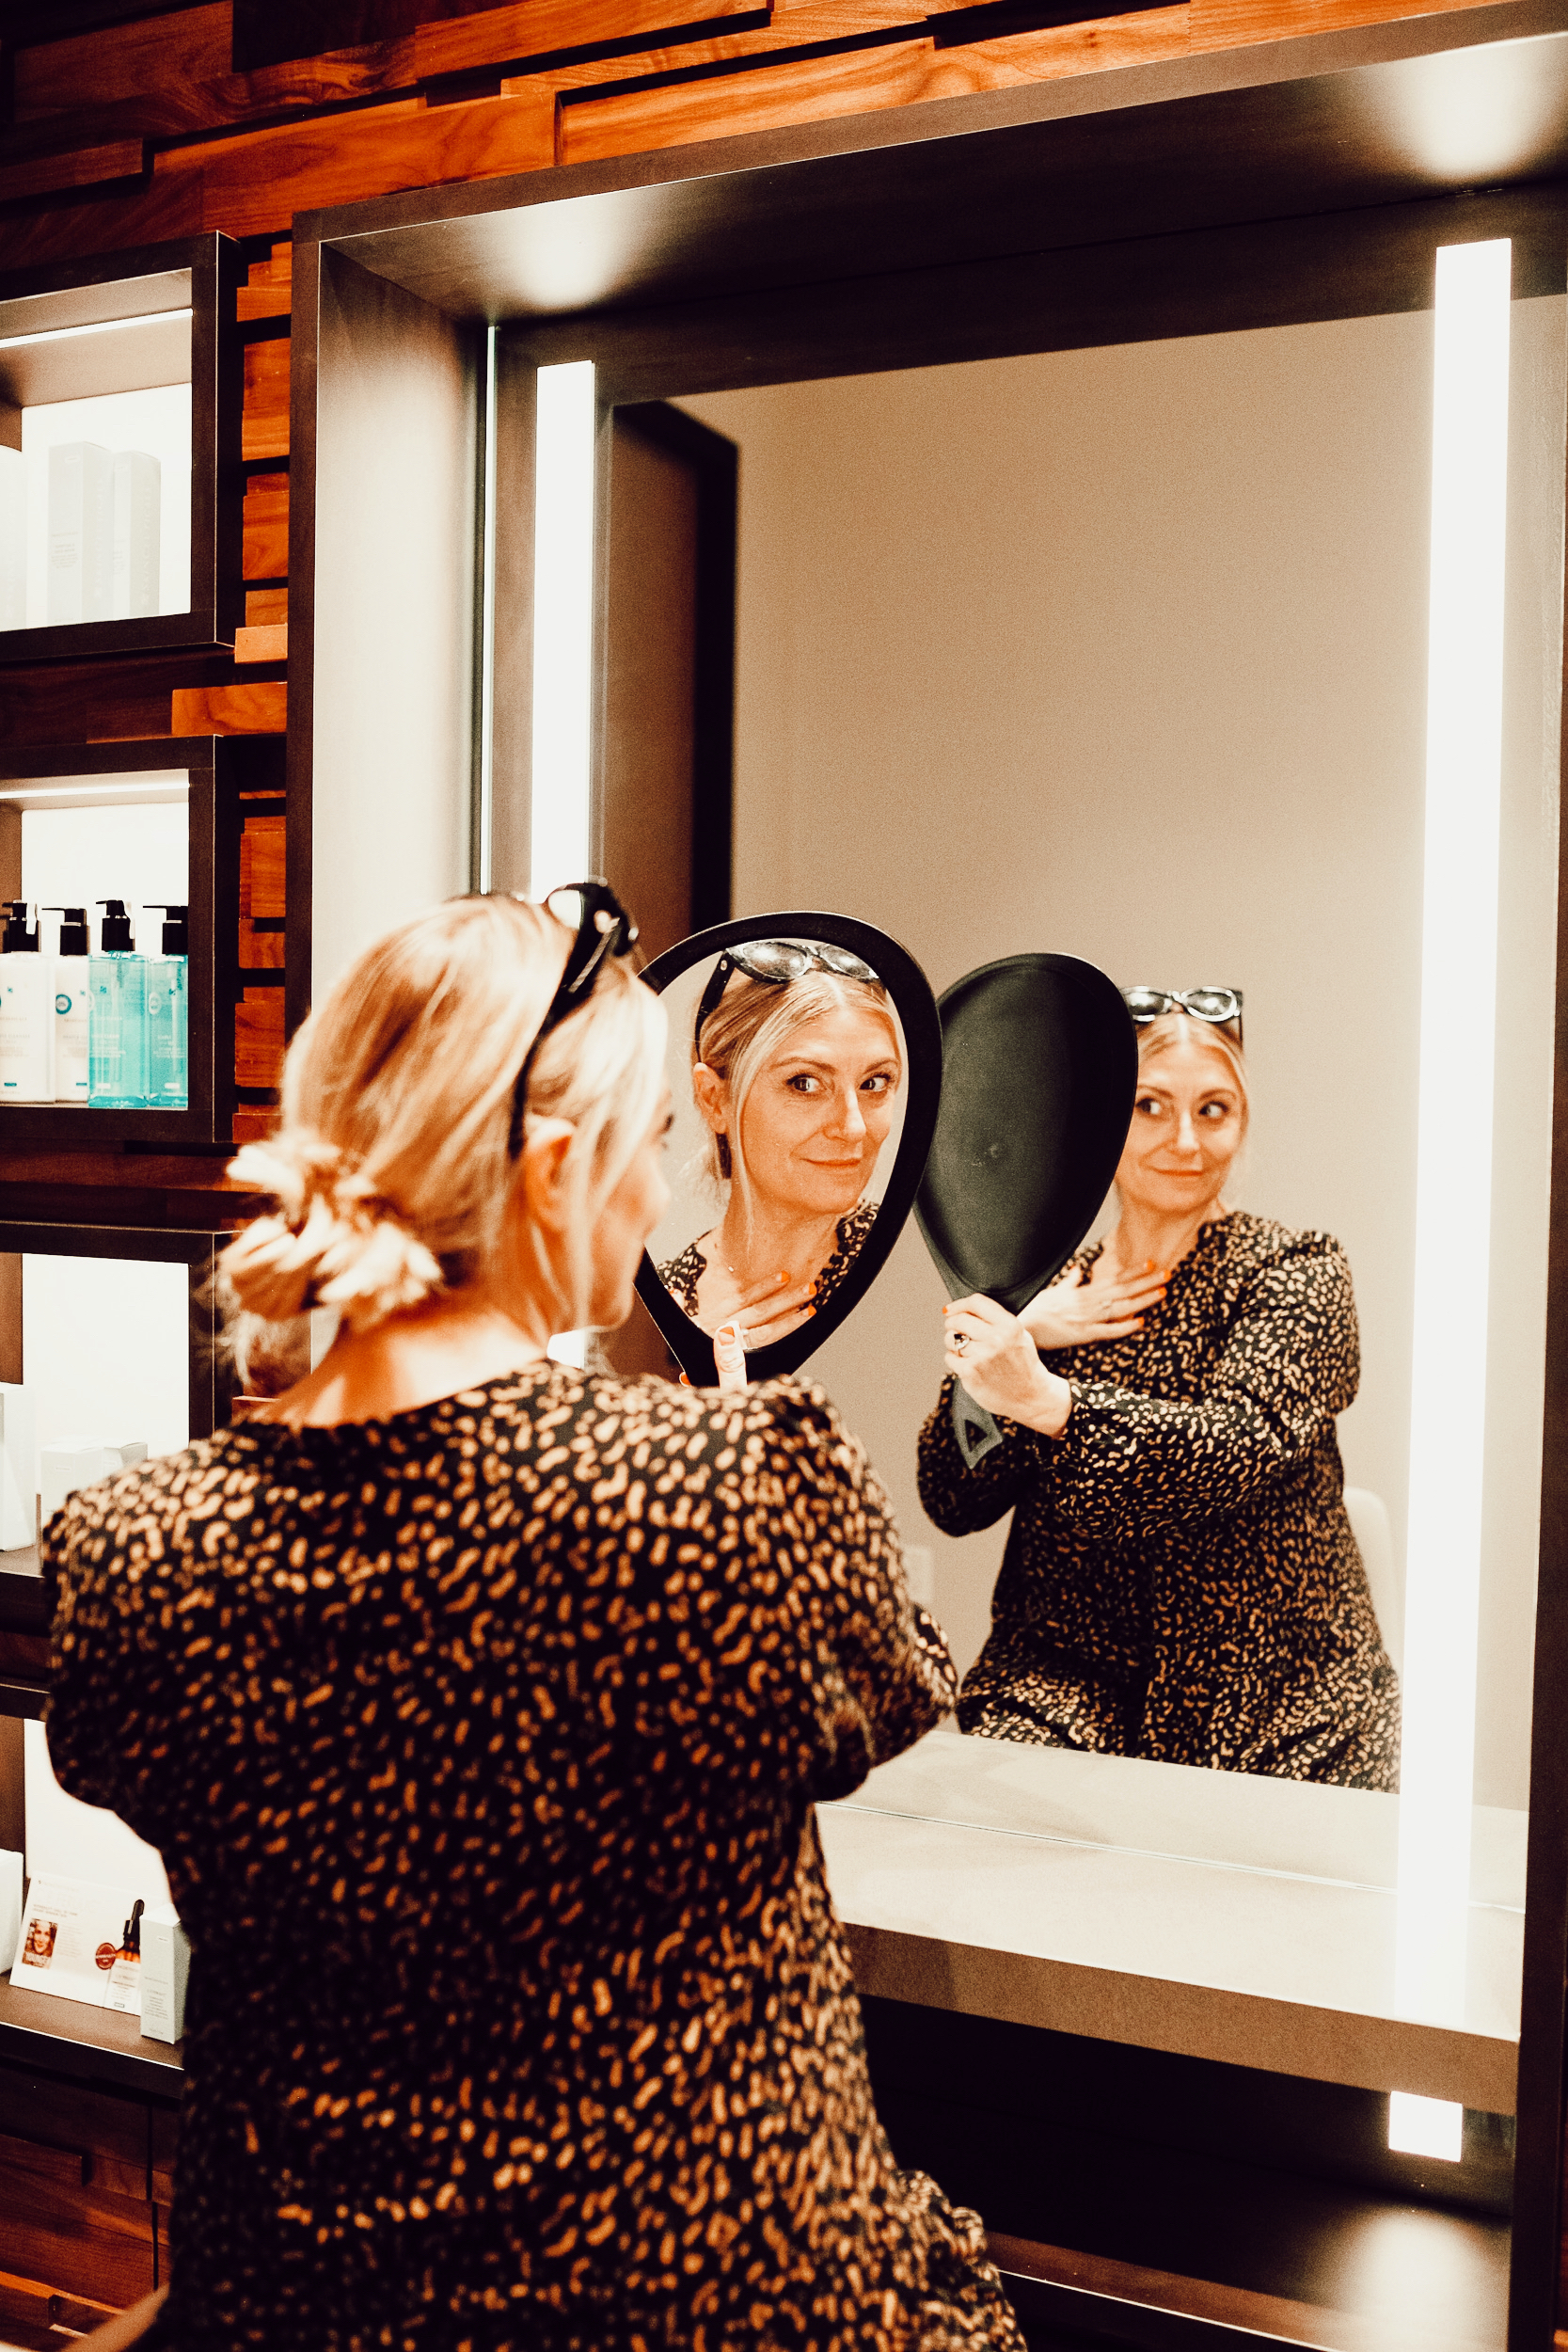 woman admiring herself in a mirror